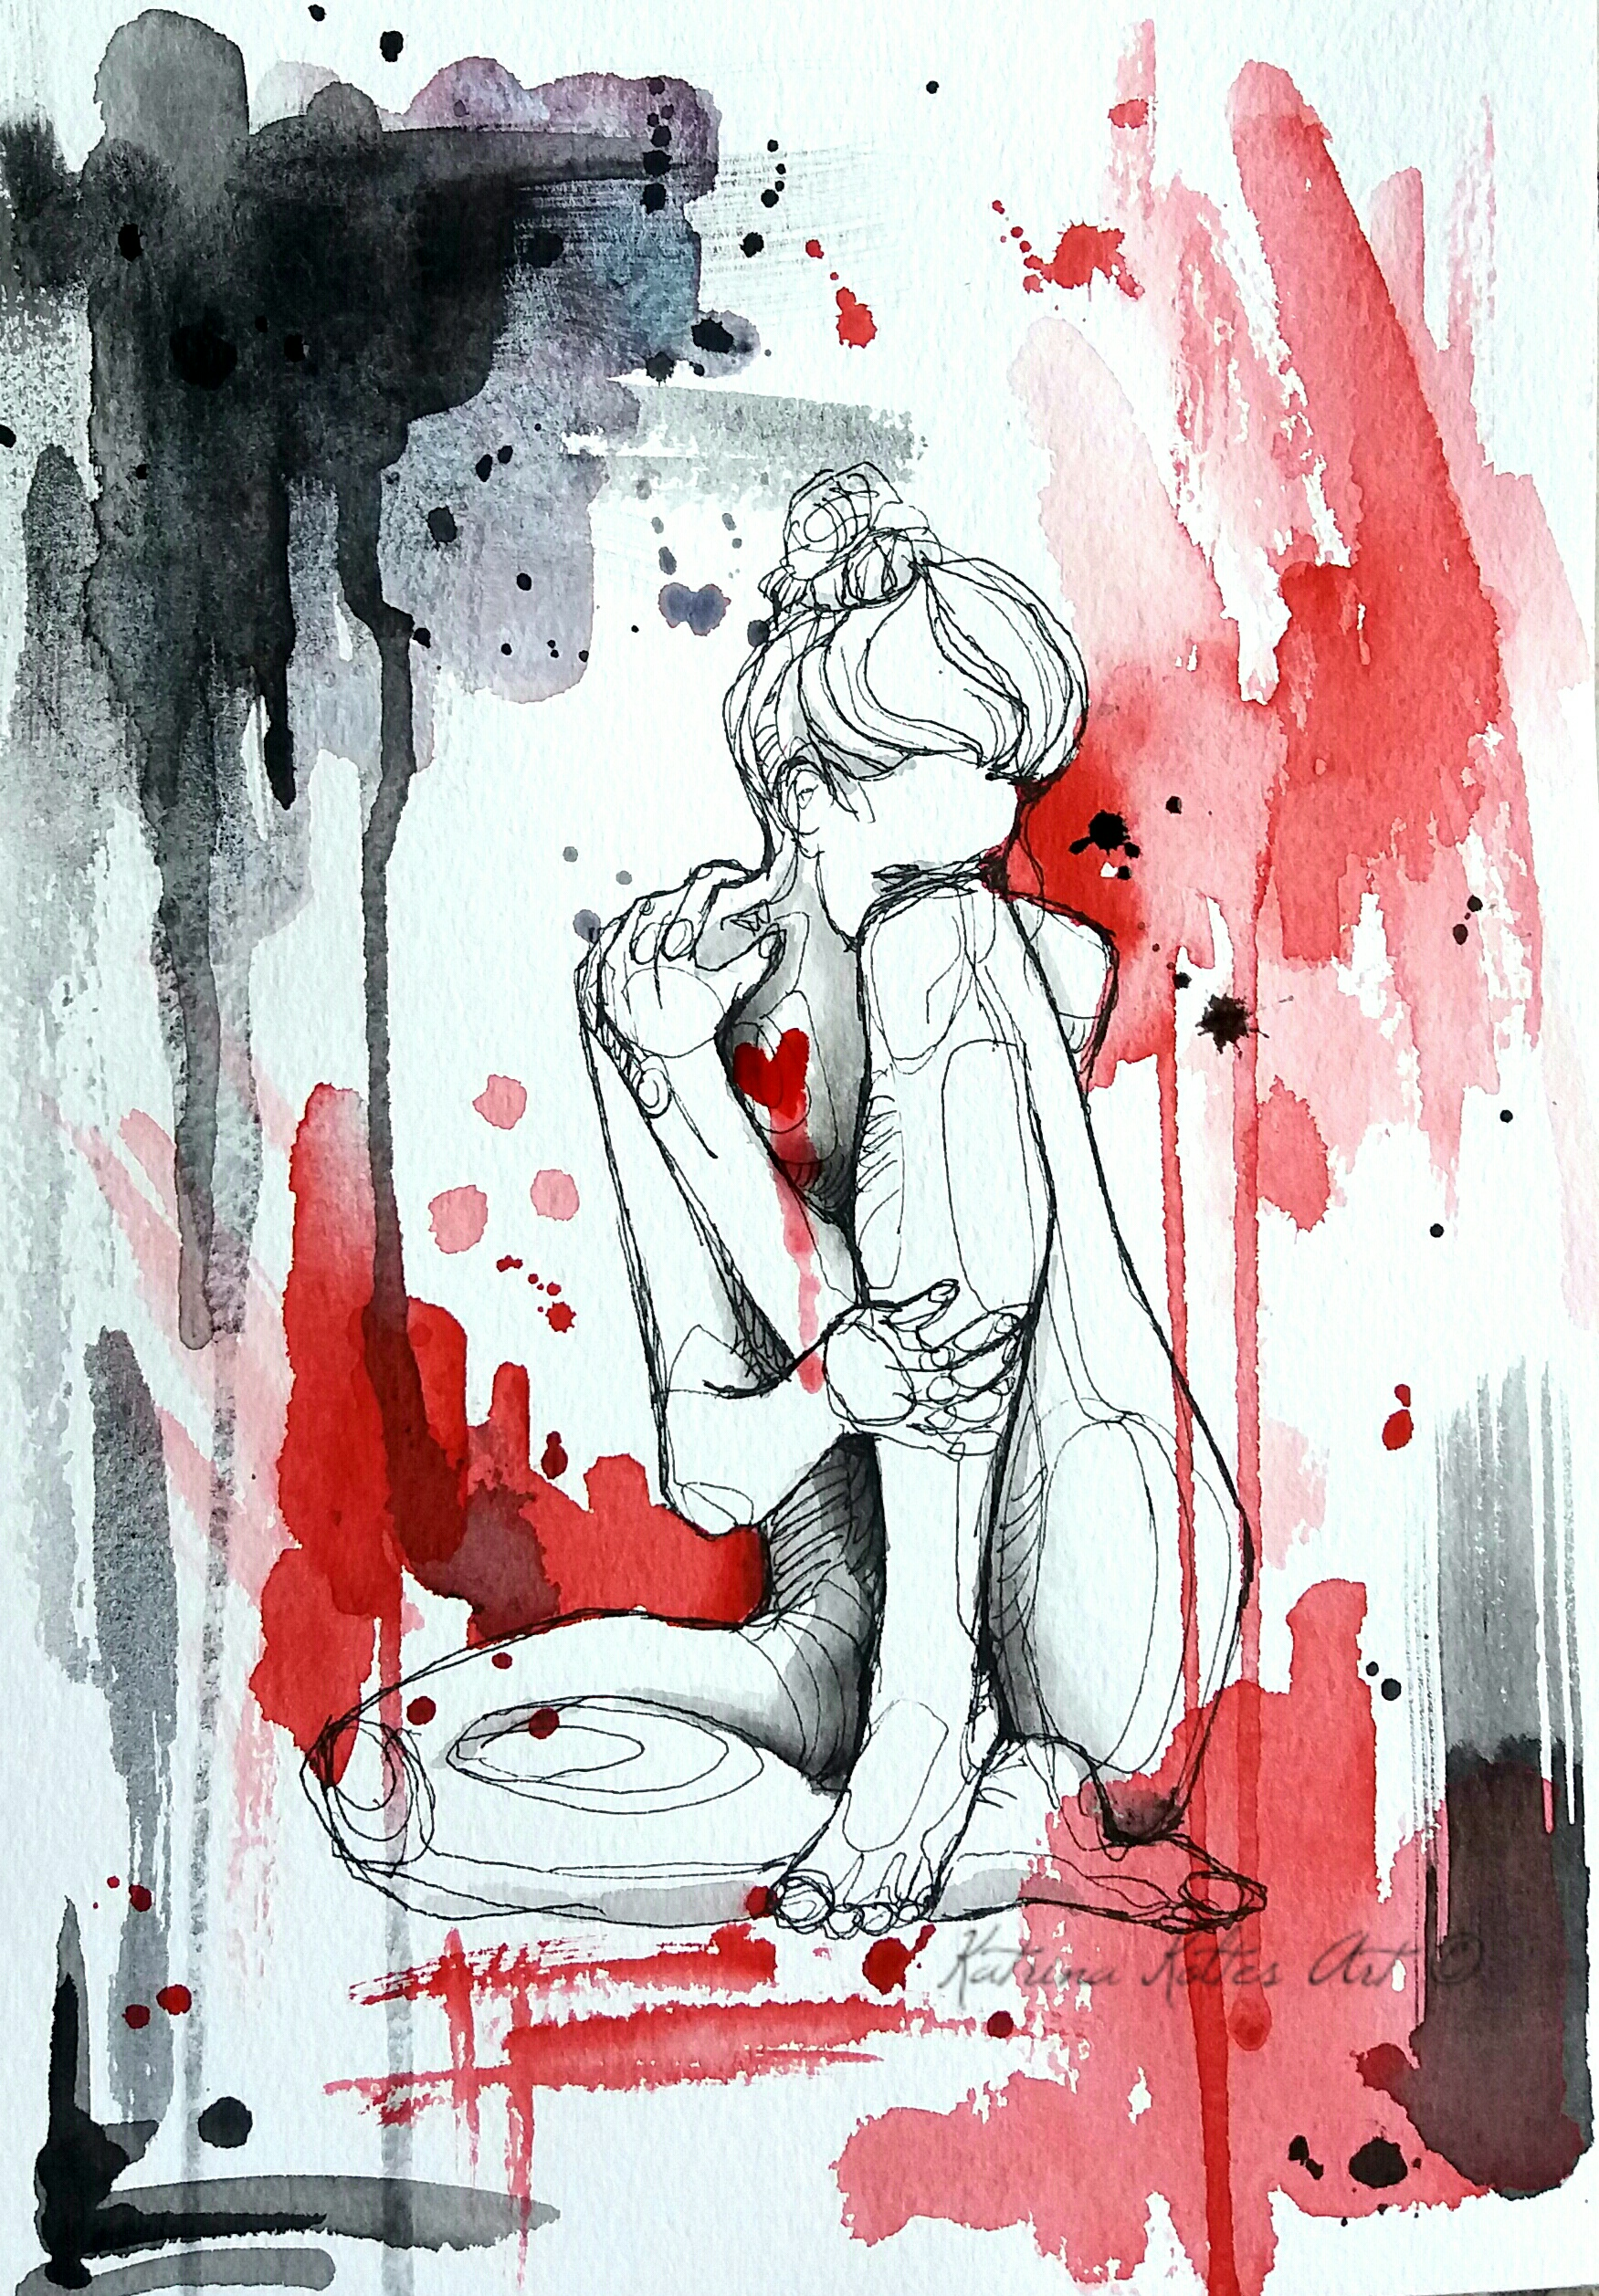 Картинки про разбитые чувства к нему